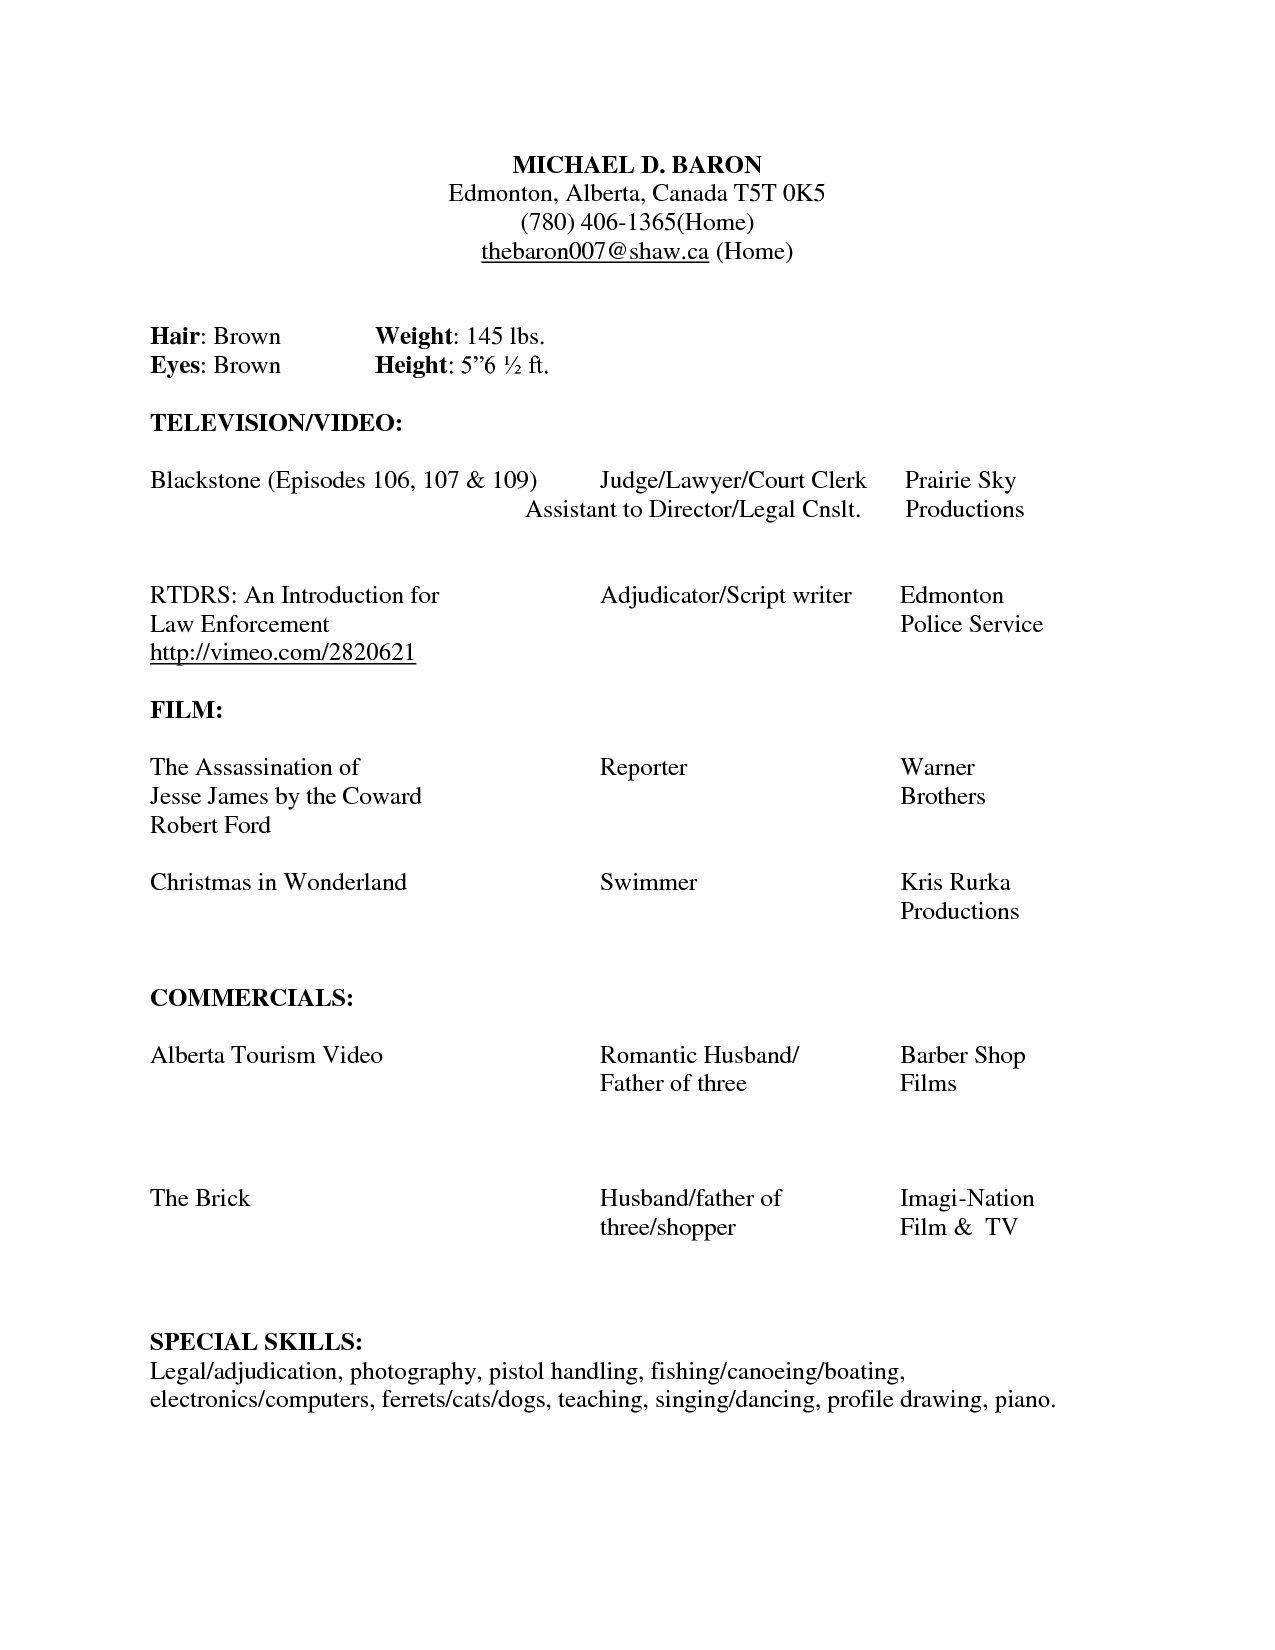 Beginner Acting Resume Sample Beginner Acting Resume